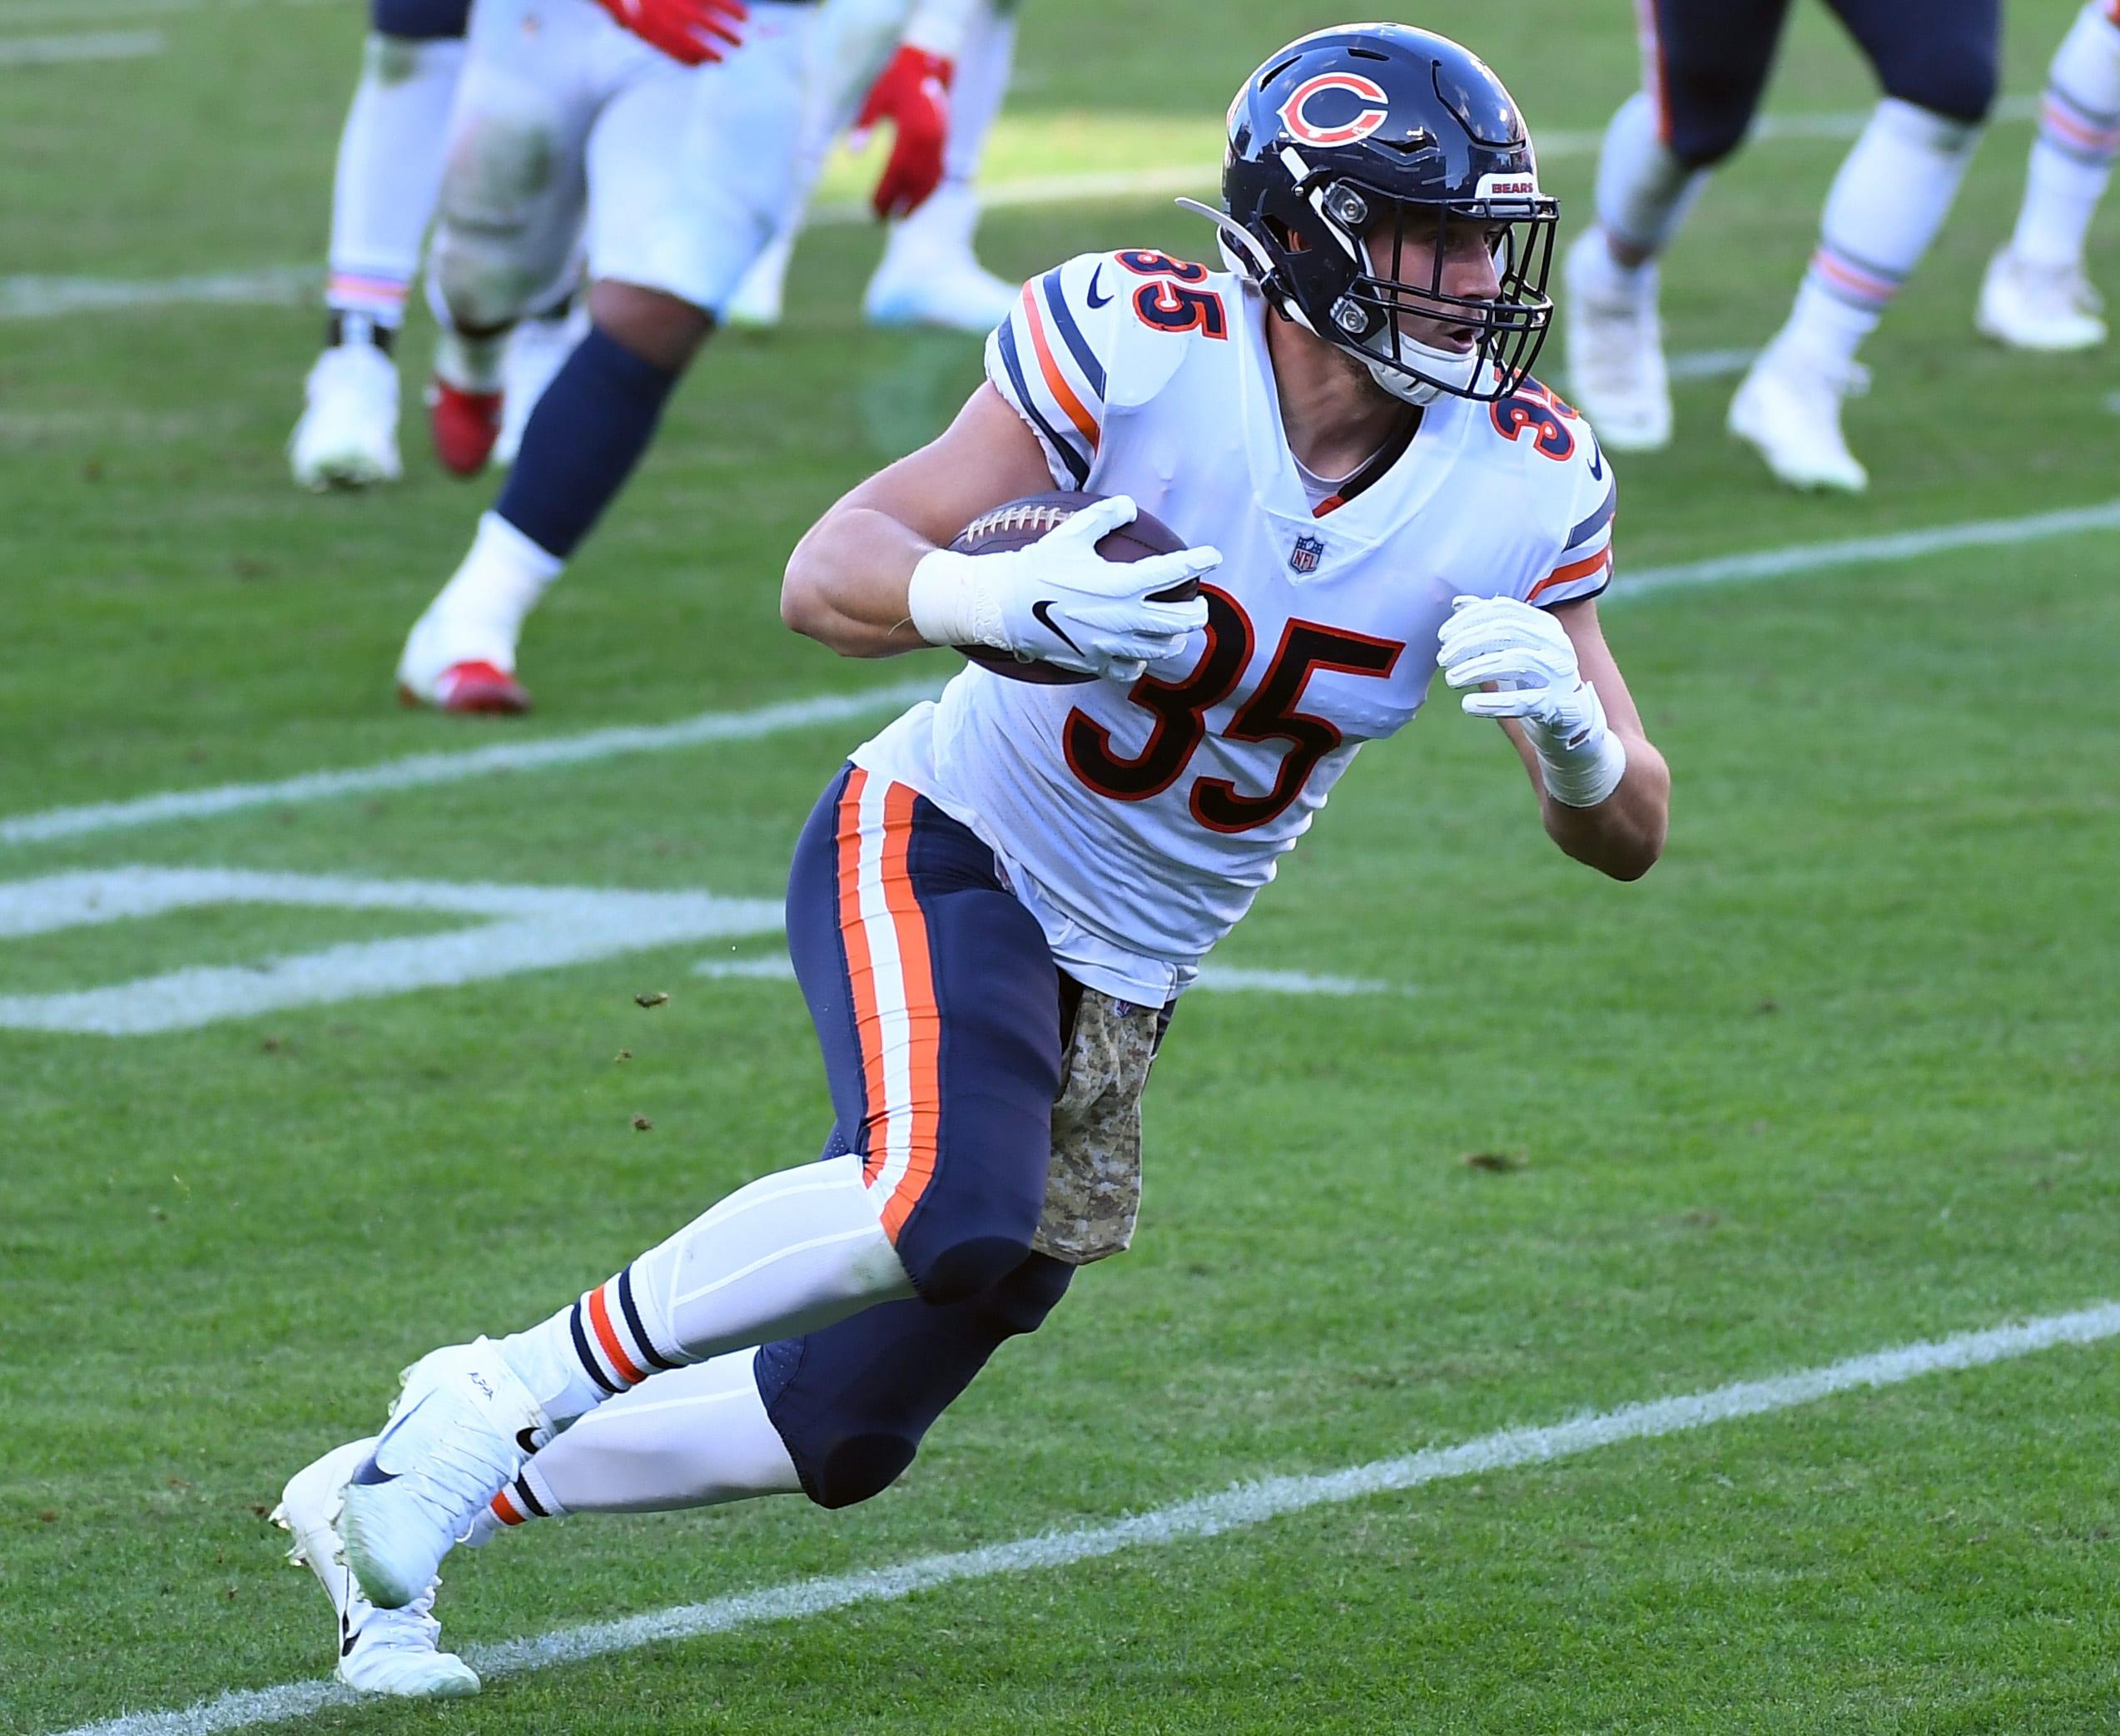 Ryan nall, bears